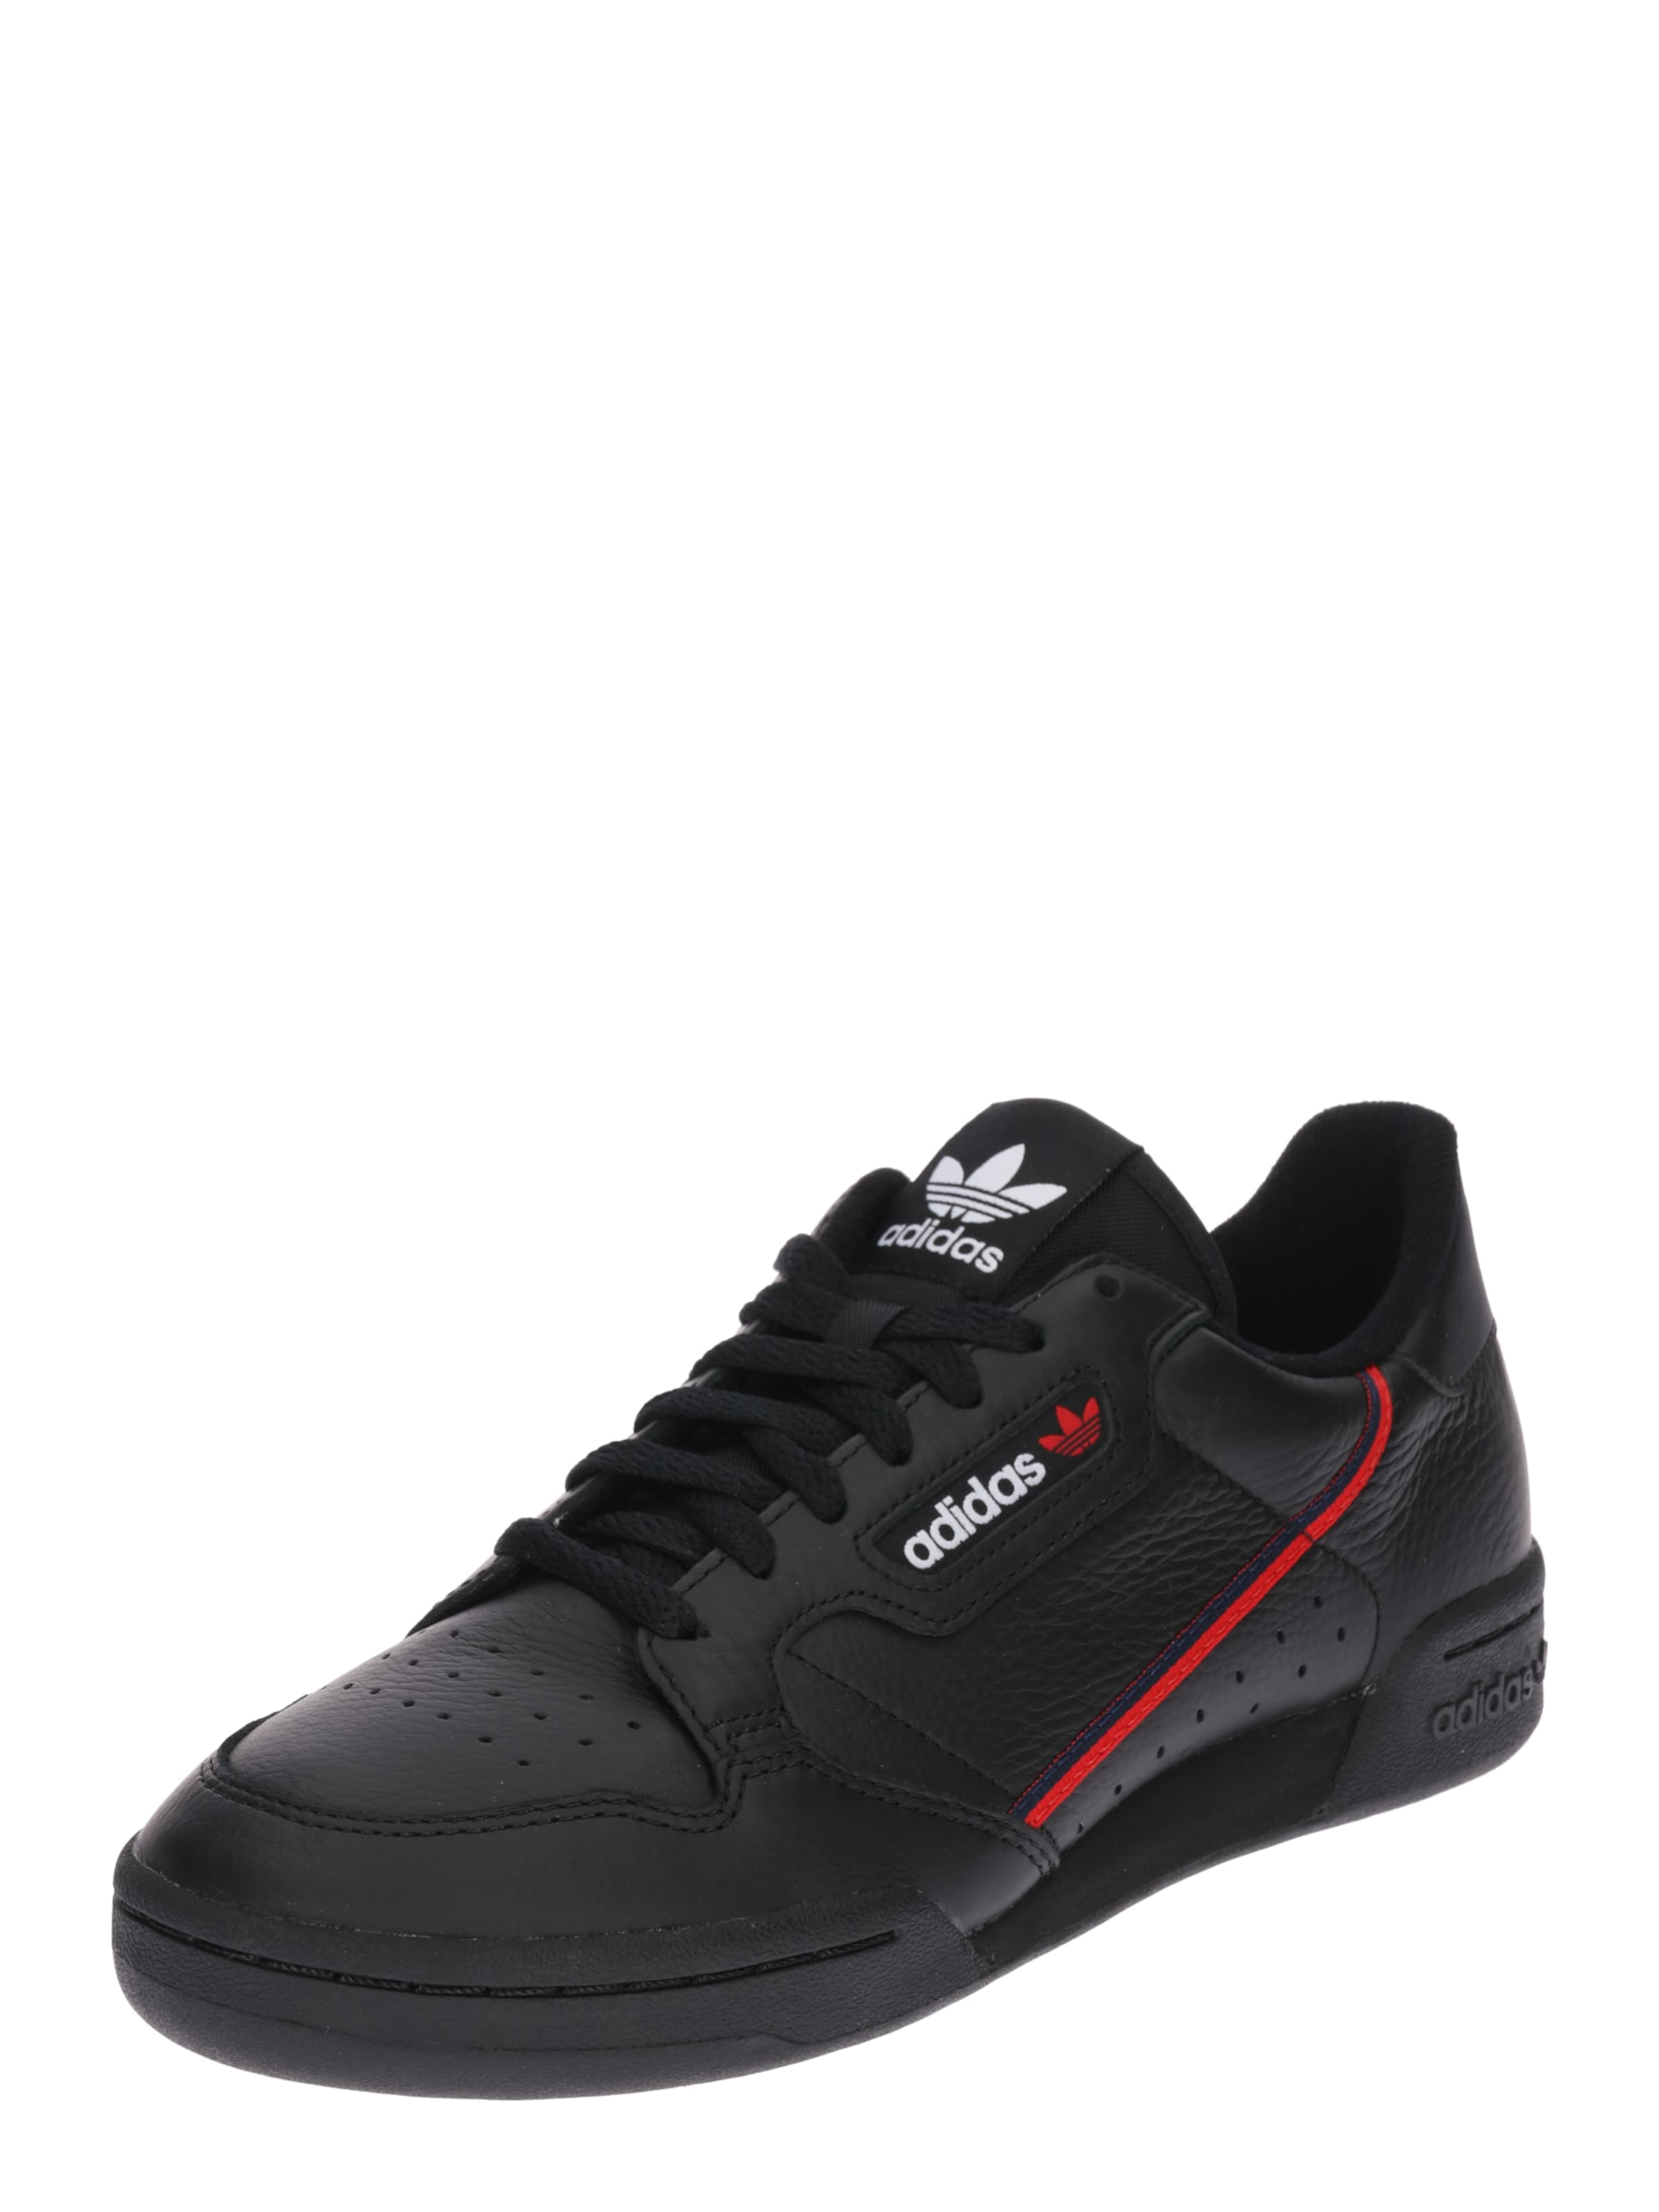 ADIDAS ORIGINALS Sneaker RASCAL Verschleißfeste billige Schuhe